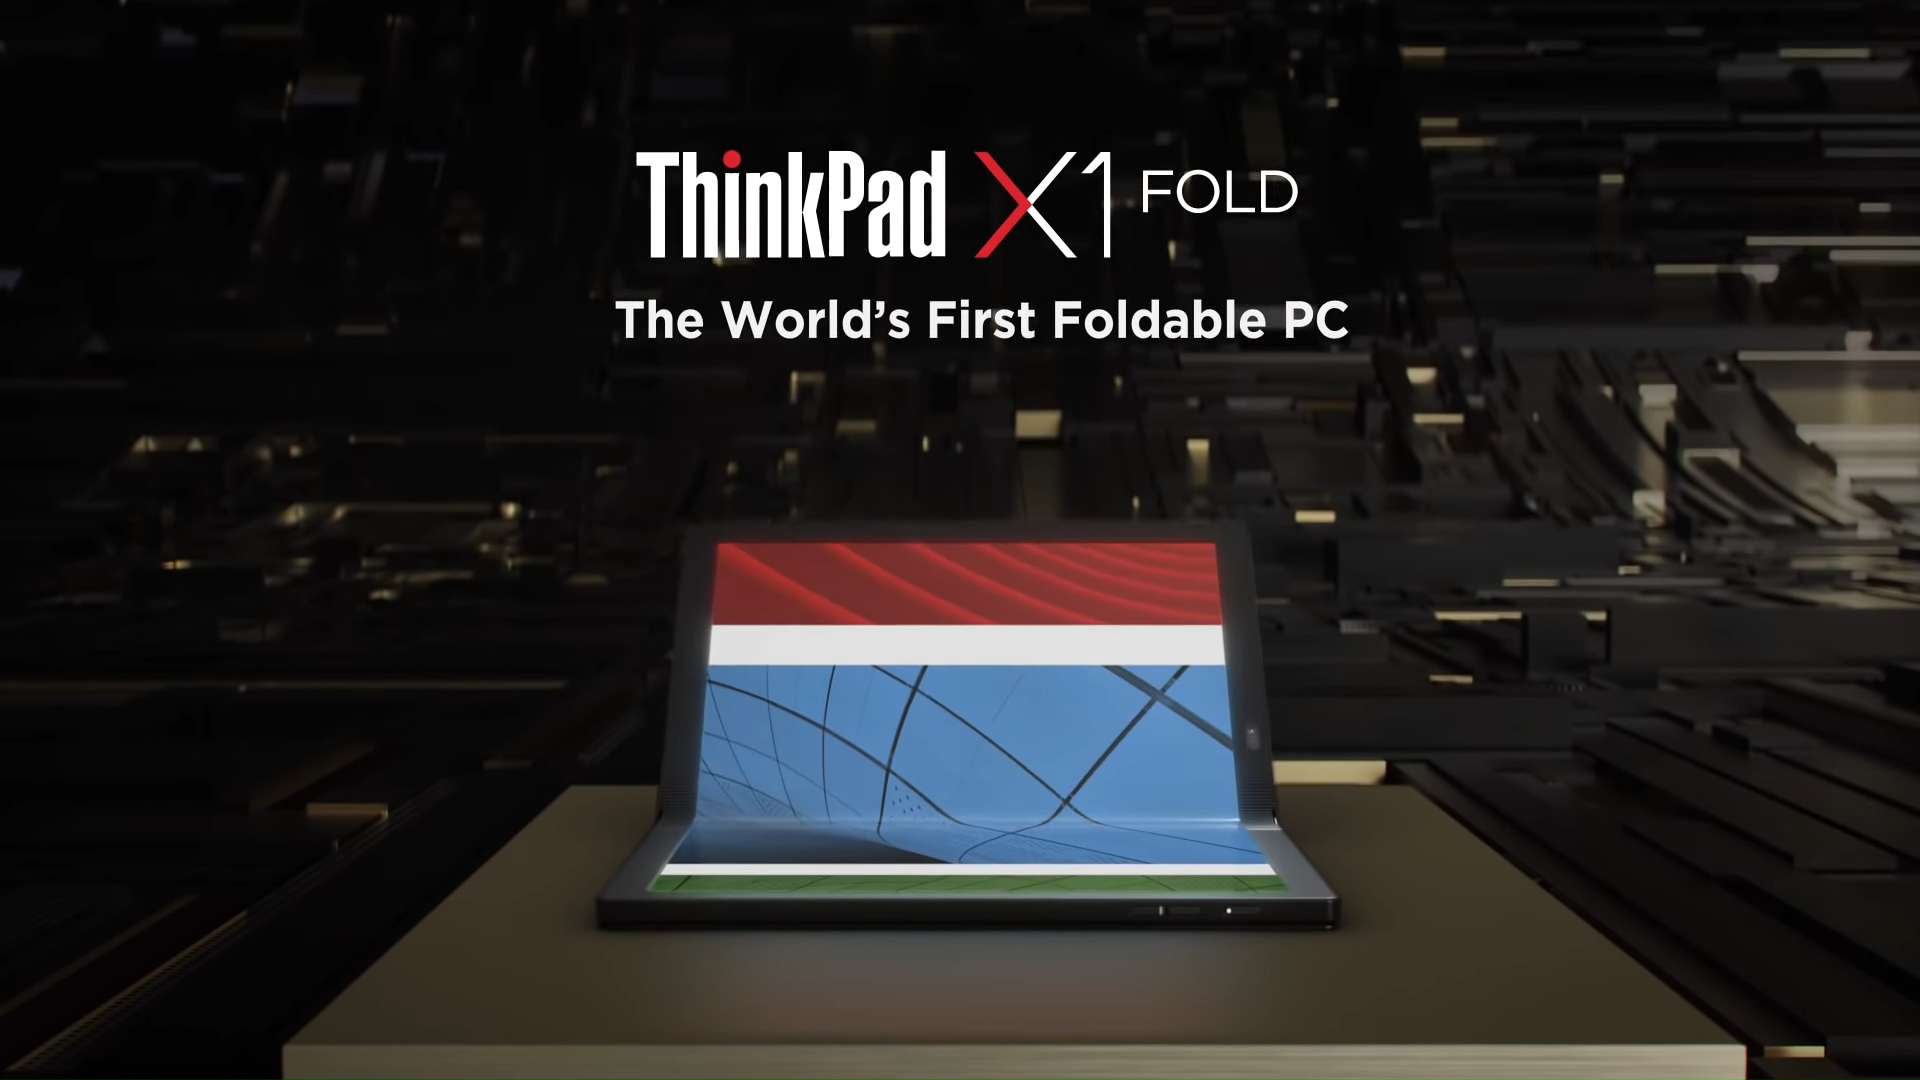 Así es la ThinkPad X1 Fold.